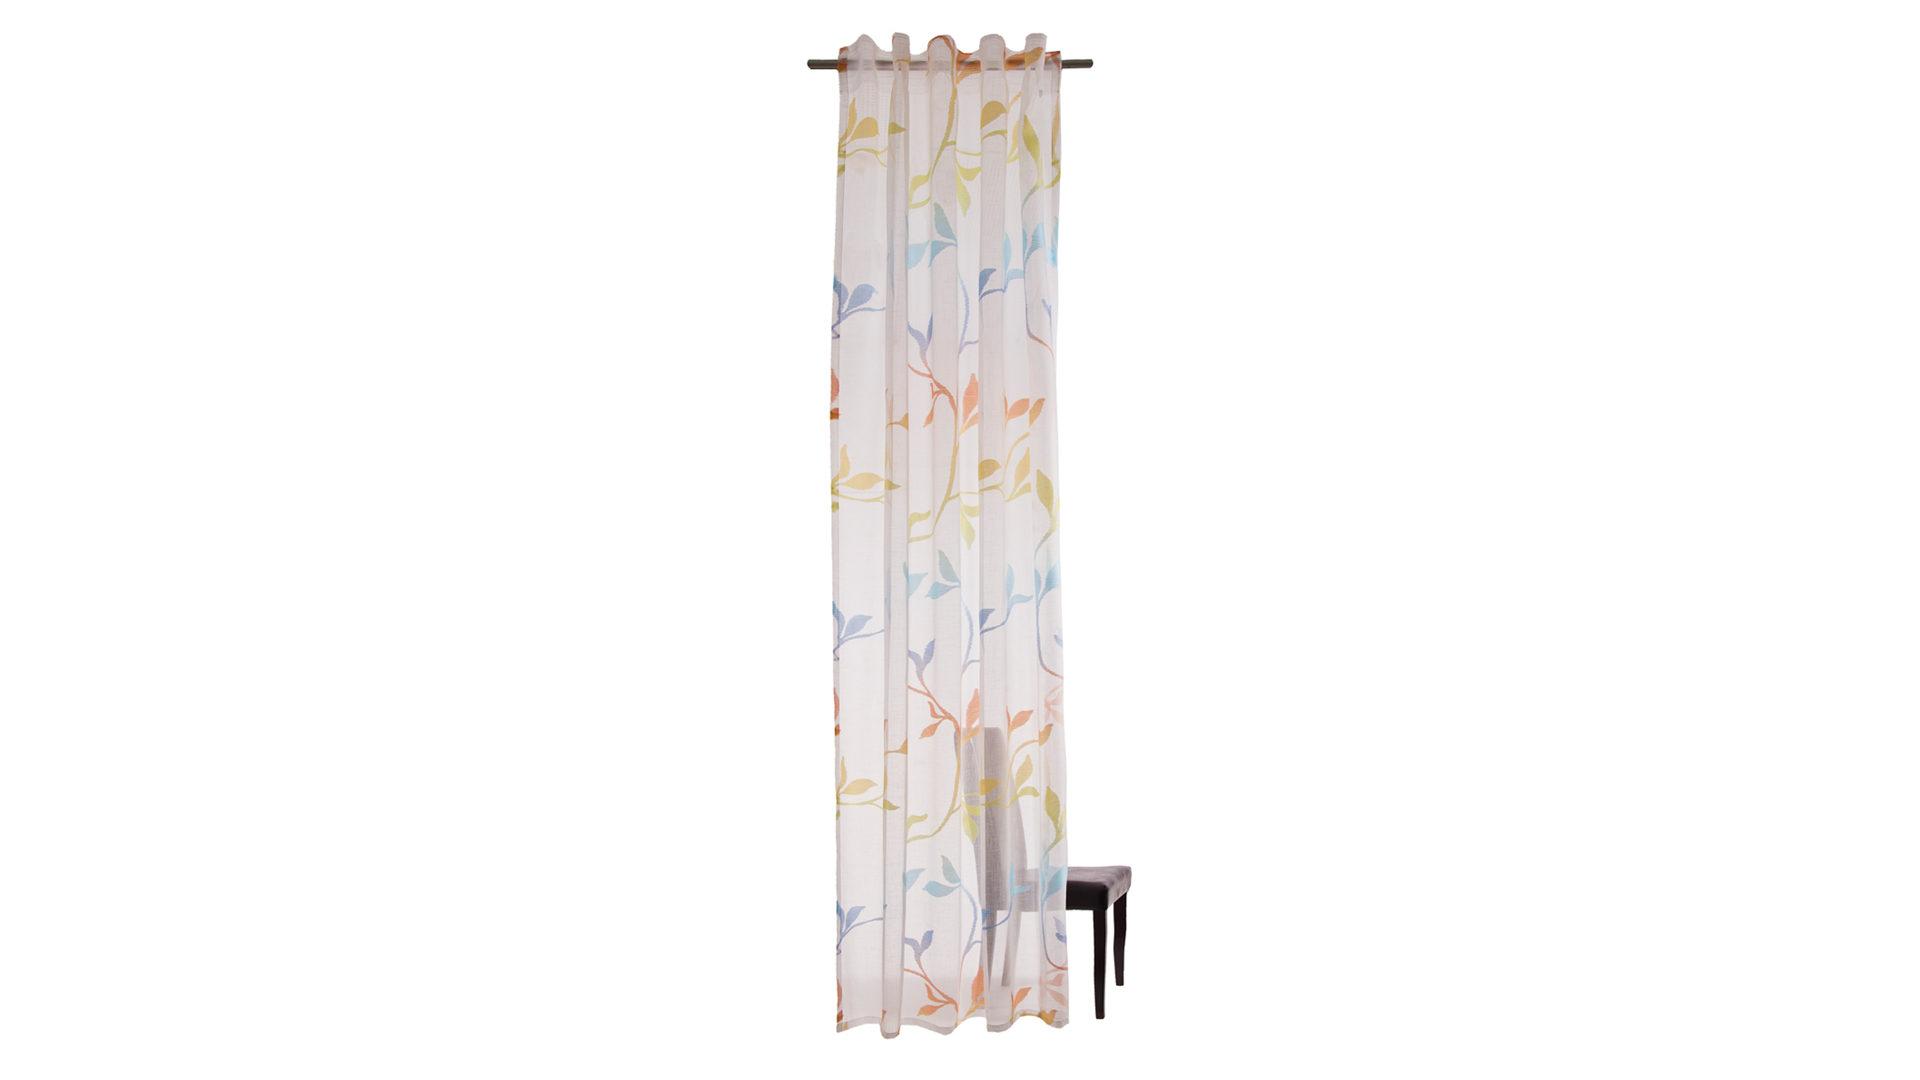 Gardinen Offenburg gardinen vorhänge flexa homing vorhang set ösenschal